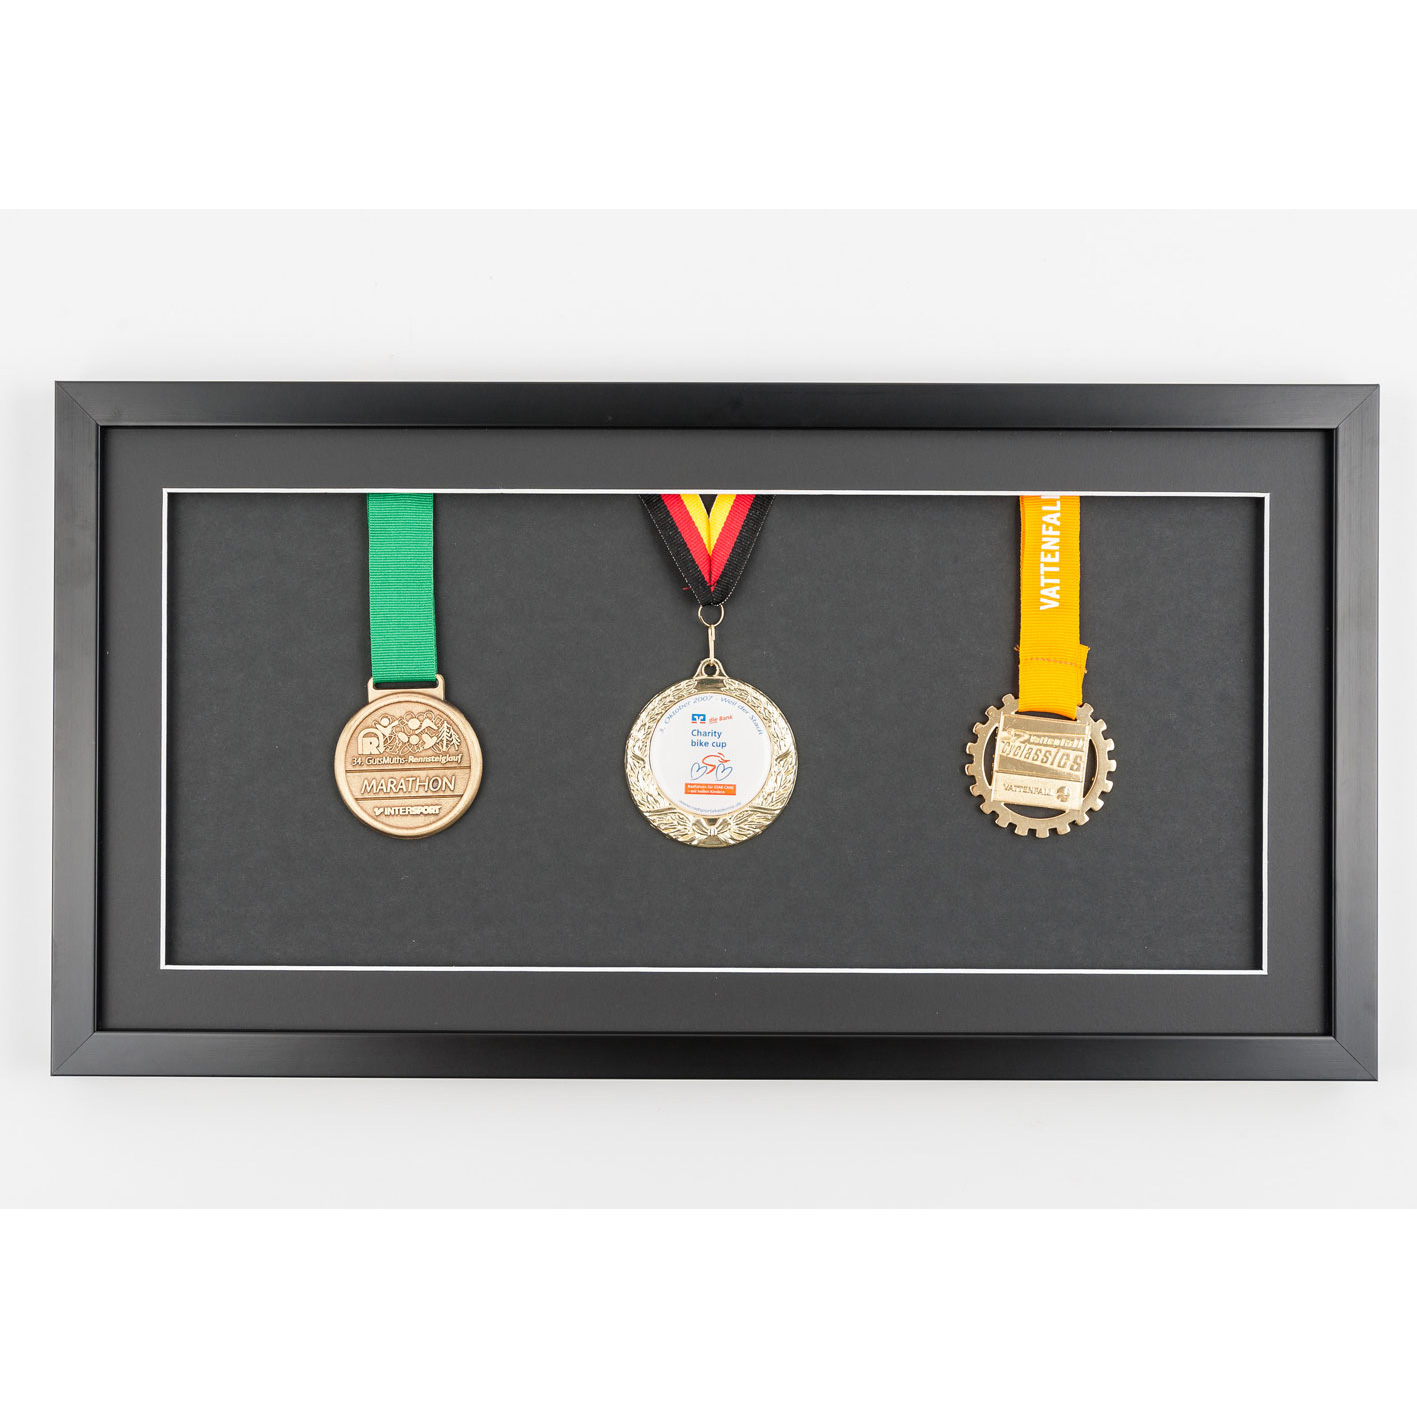 Rama na medale 25x50 cm, czarna